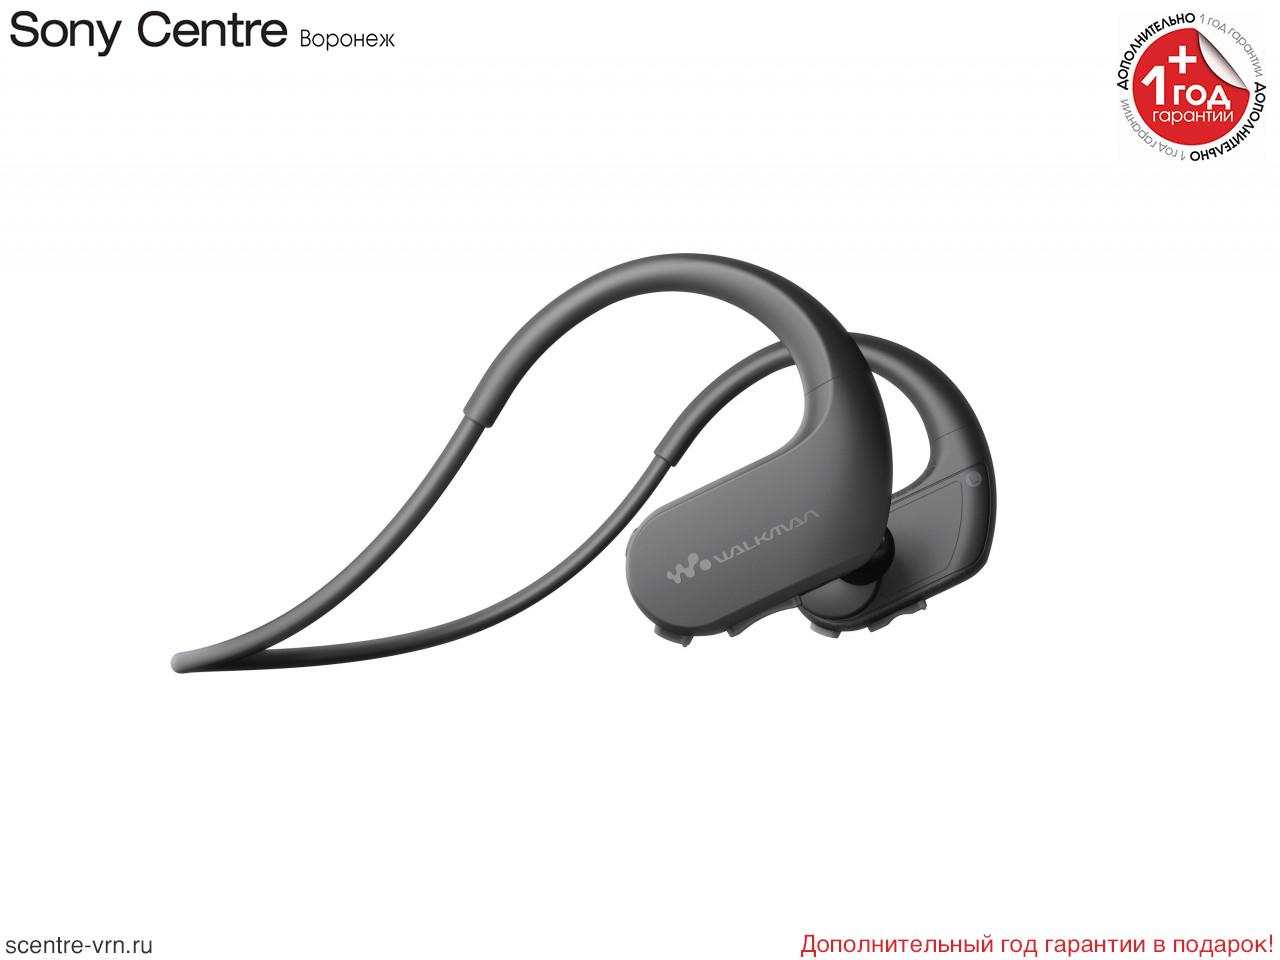 Спортивный плеер Sony NW-WS625B, 16 ГБ, цвет чёрный